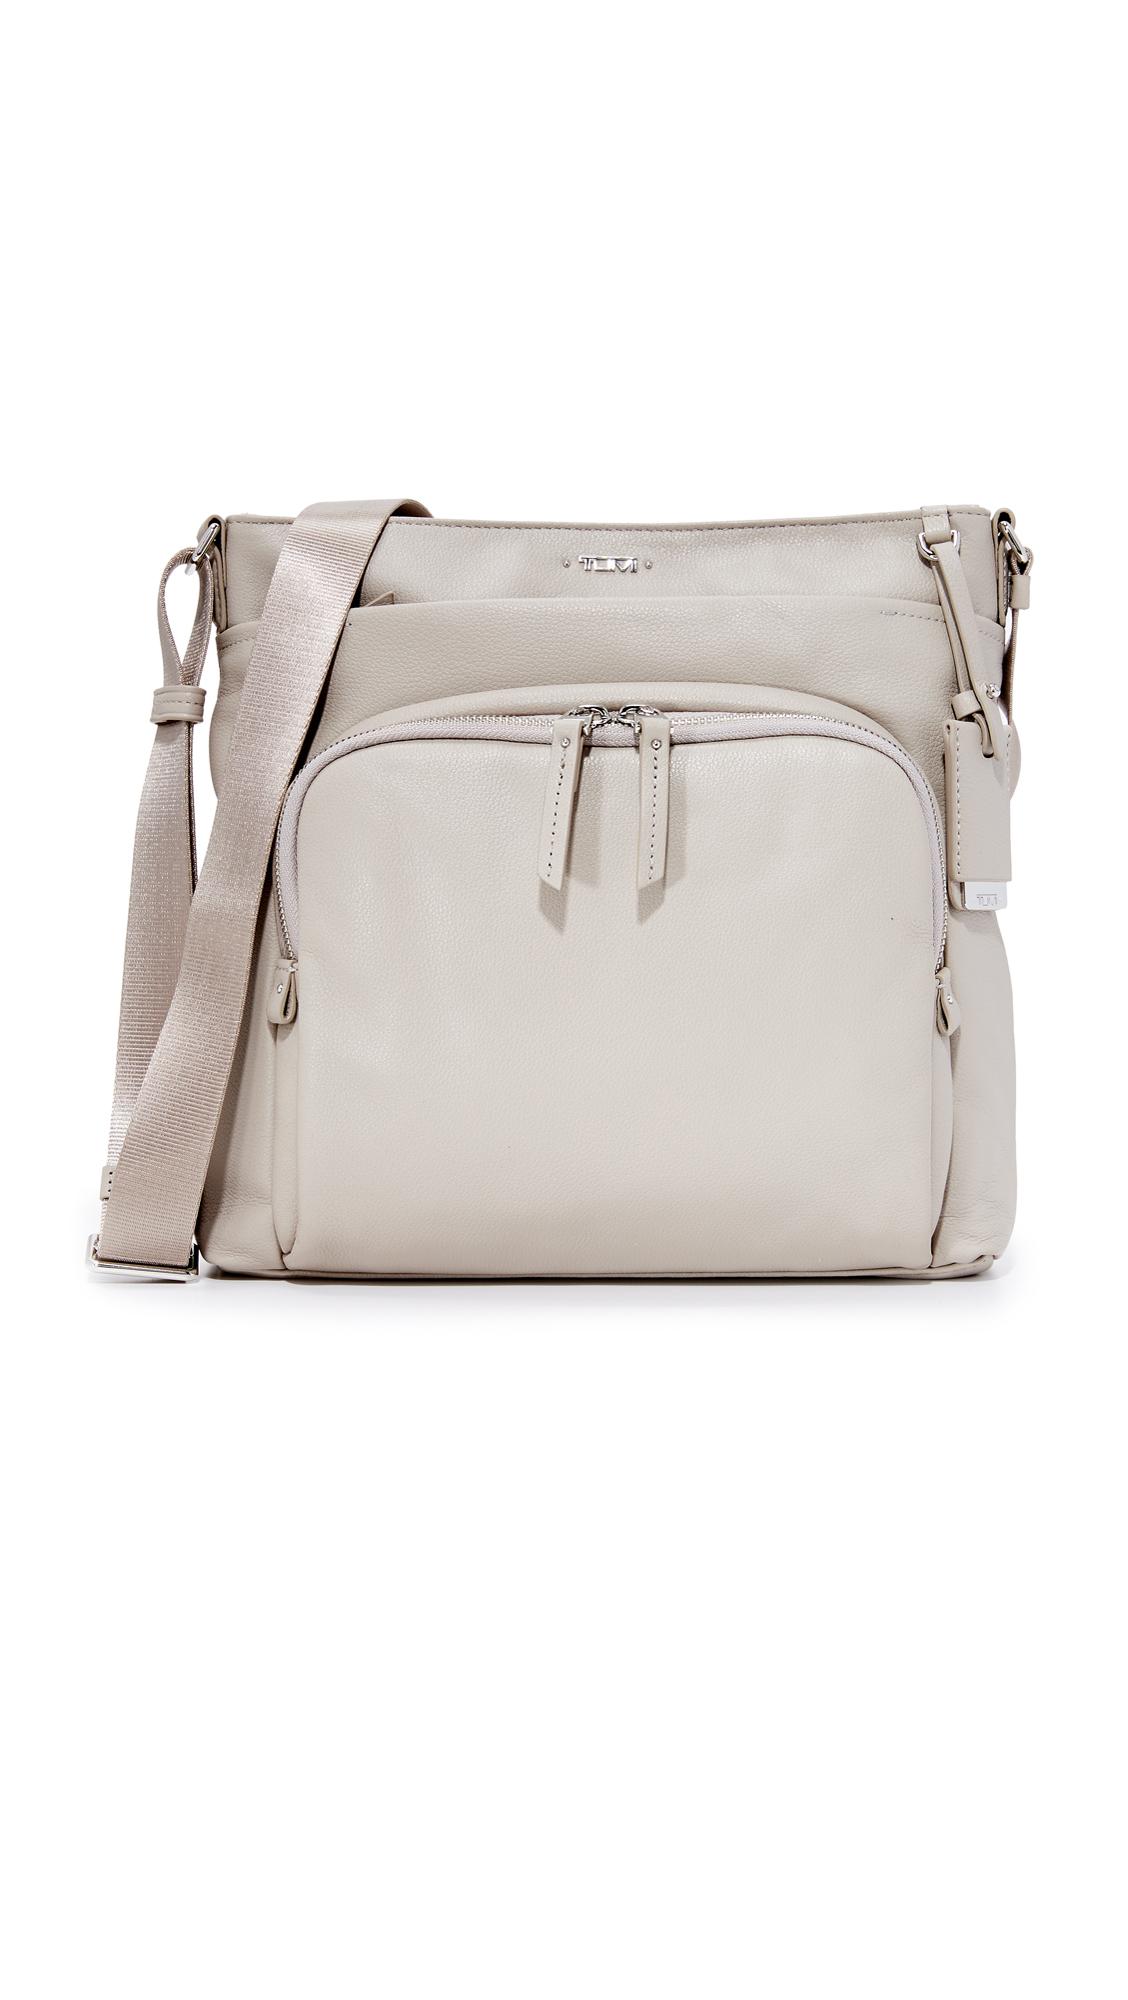 Tumi Capri Cross Body Bag - Grey